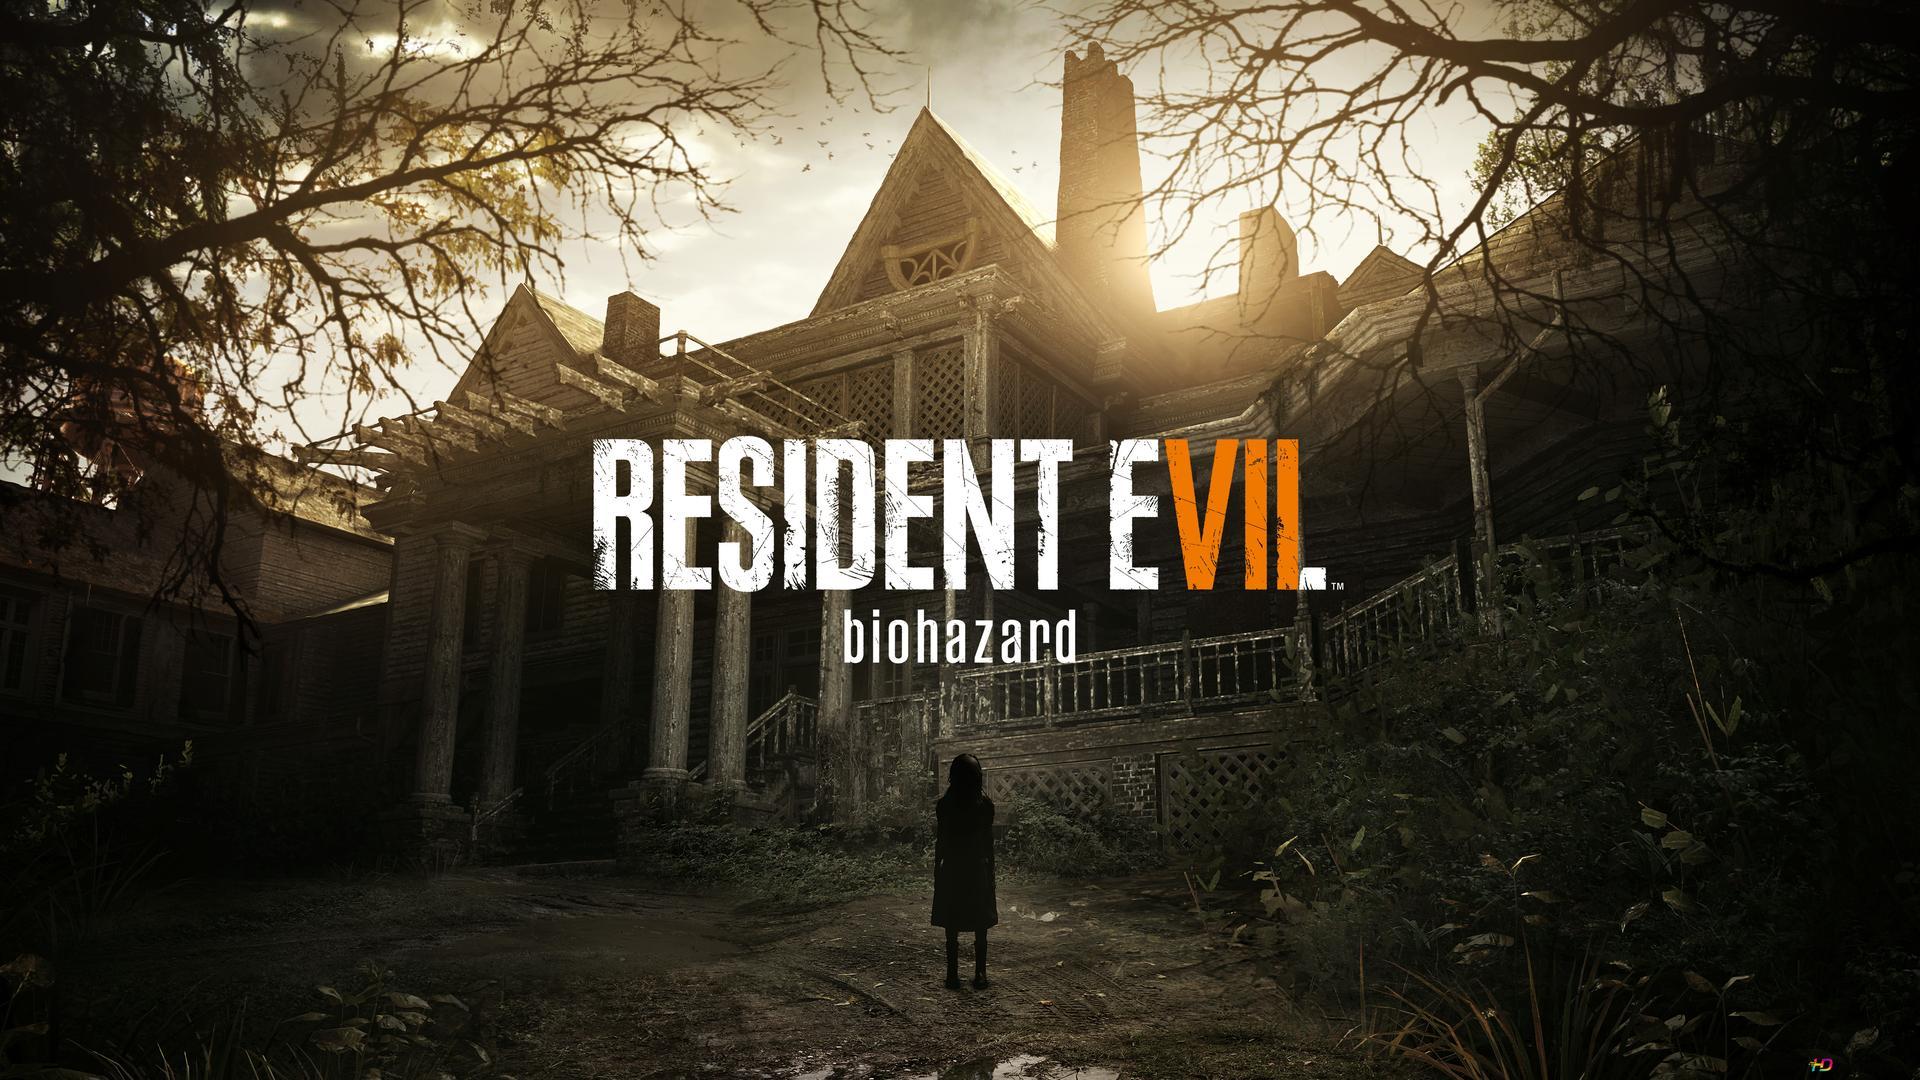 Resident Evil 7 Biohazard Survival Horror Game Hd Wallpaper Download